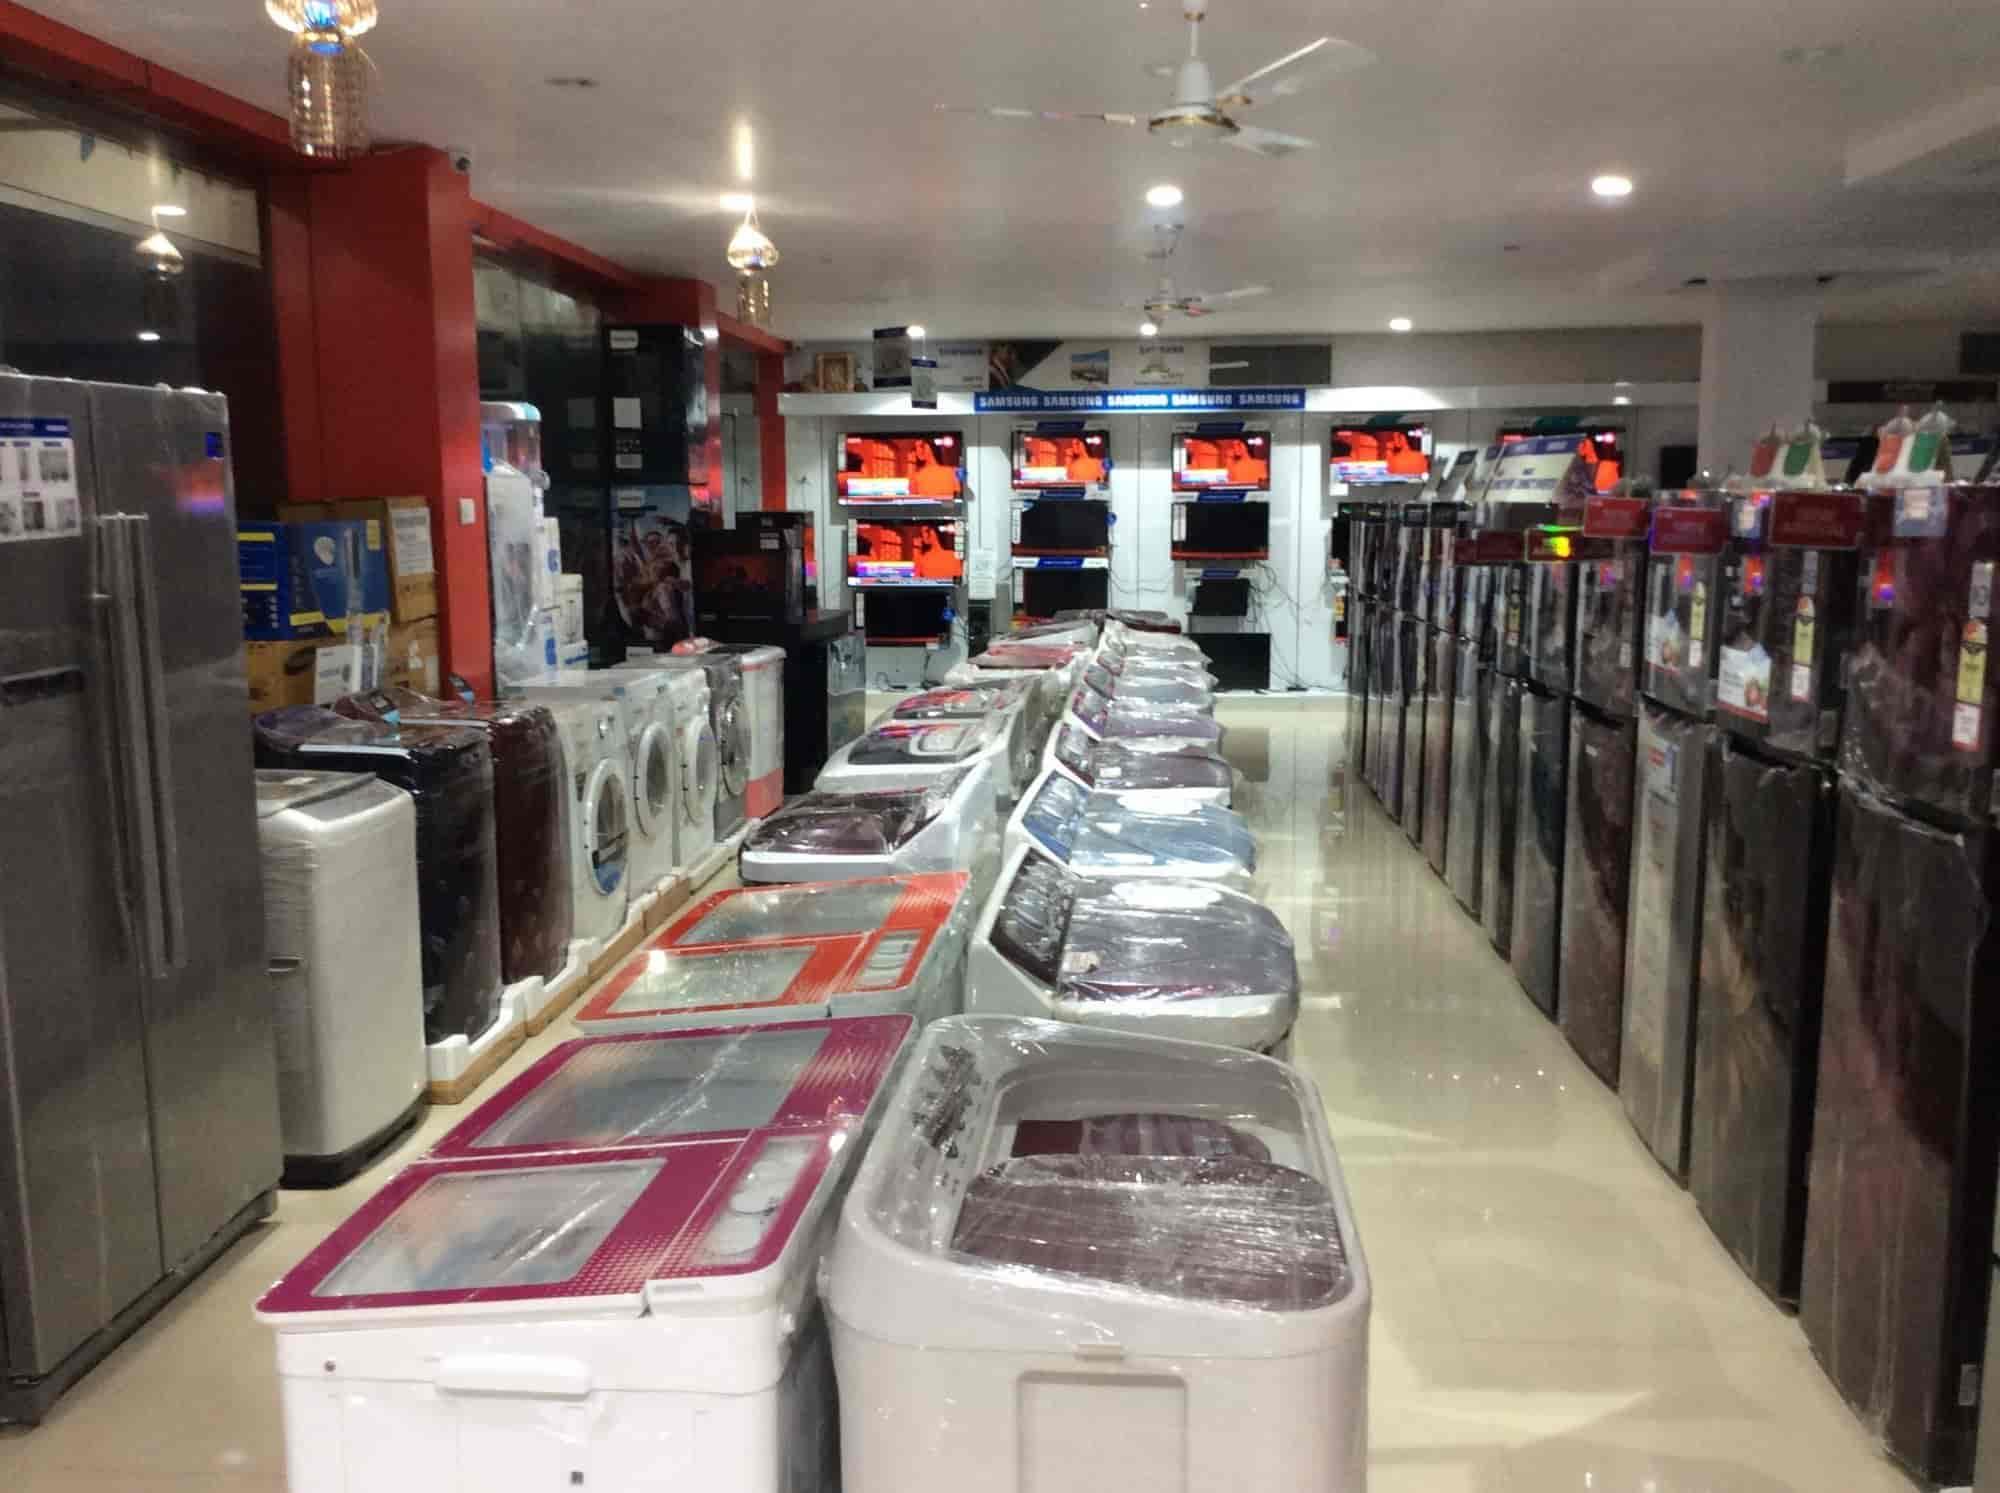 Maa Amola Electronics Photos, Mopka, Bilaspur-Chhattisgarh- Pictures